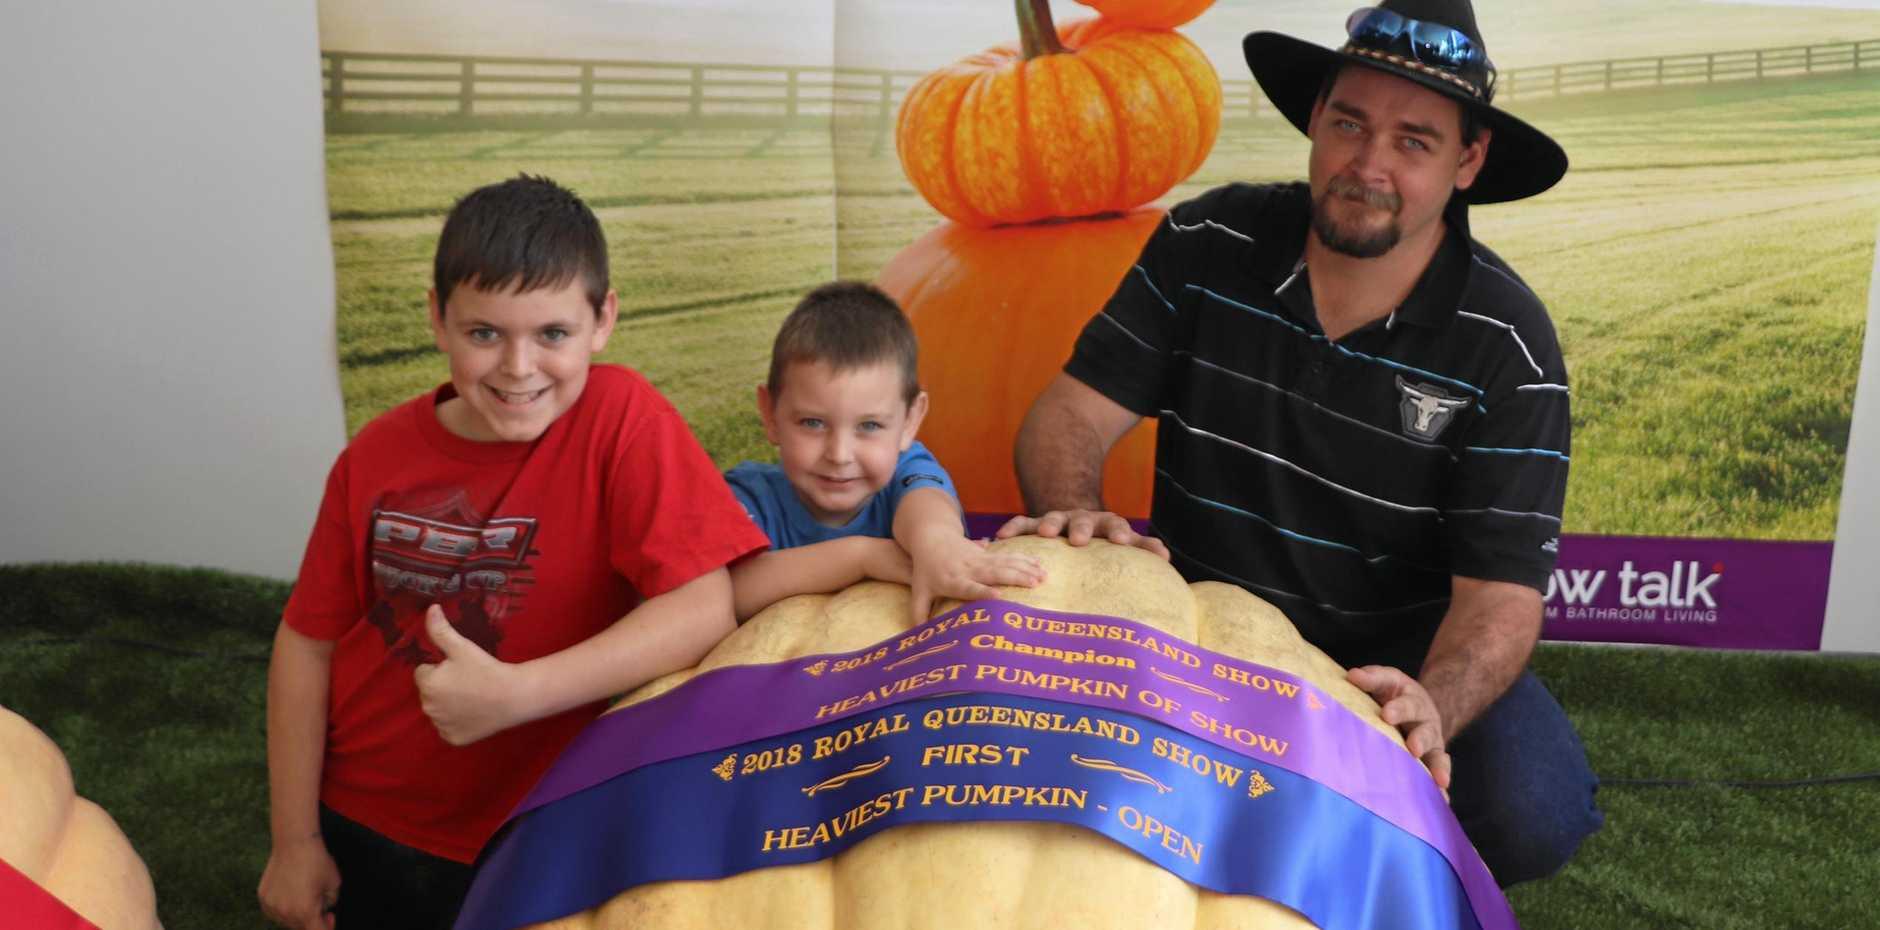 Tyler, Jackson and Steven Fritz with the winning 260kg pumpkin.